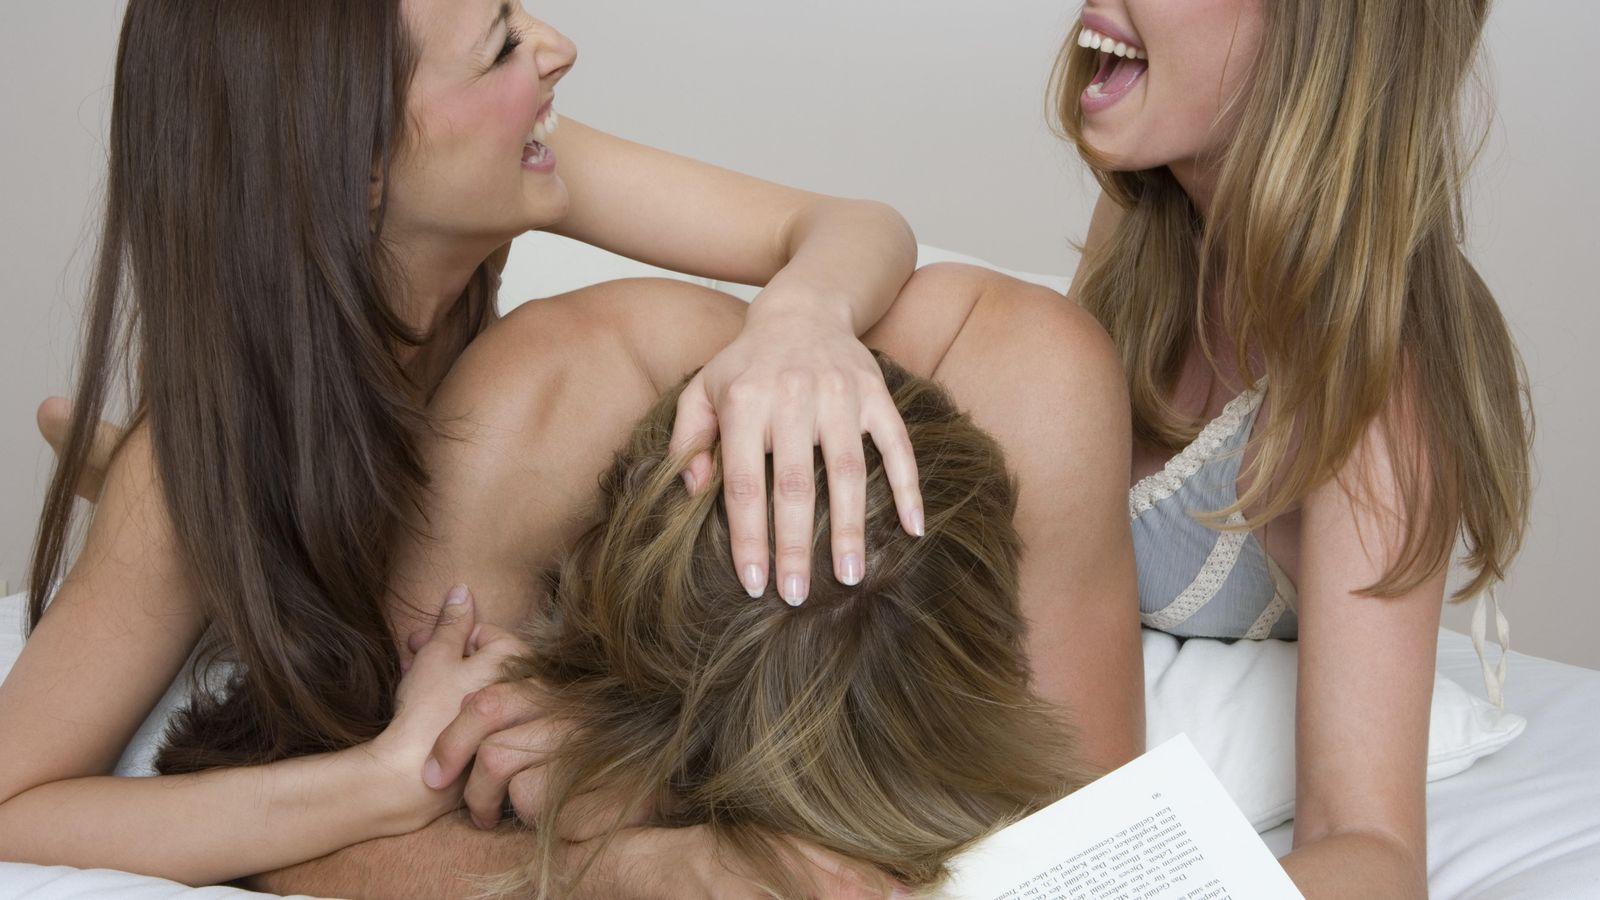 girl-playboy-mujeres-teniendo-sexo-guest